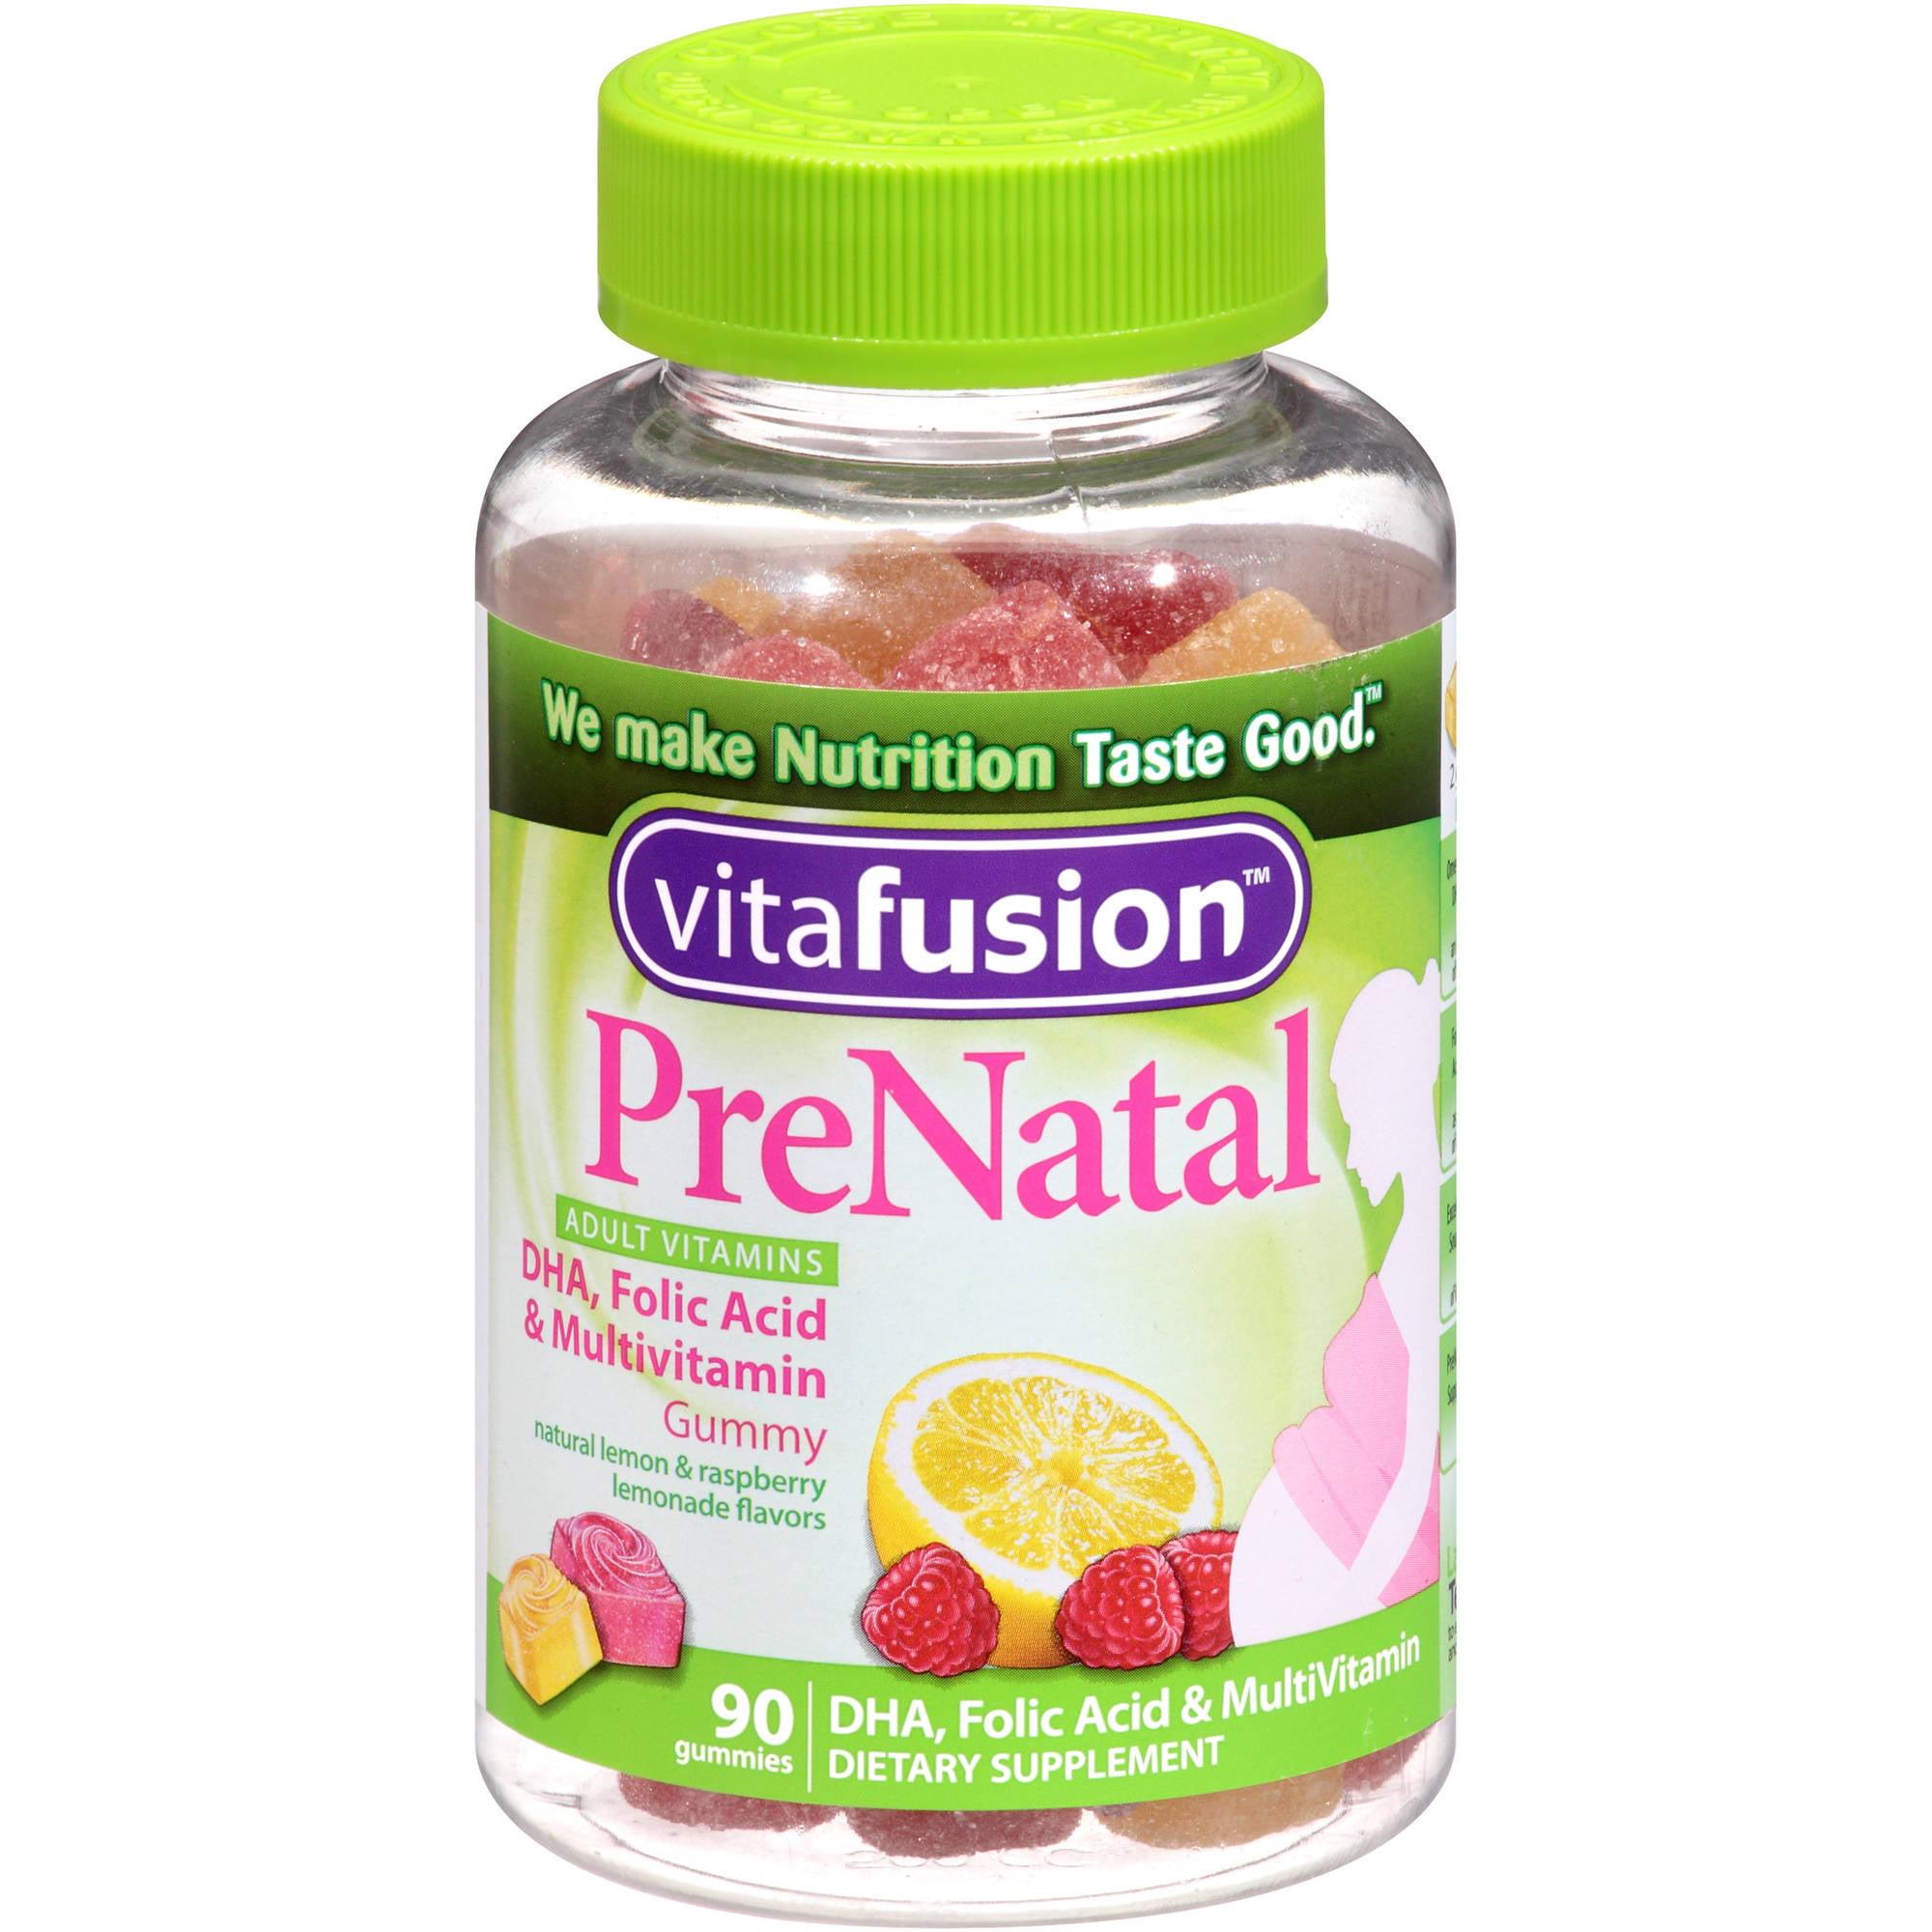 VitaFusion Prenatal Gummy Vitamins, 90ct